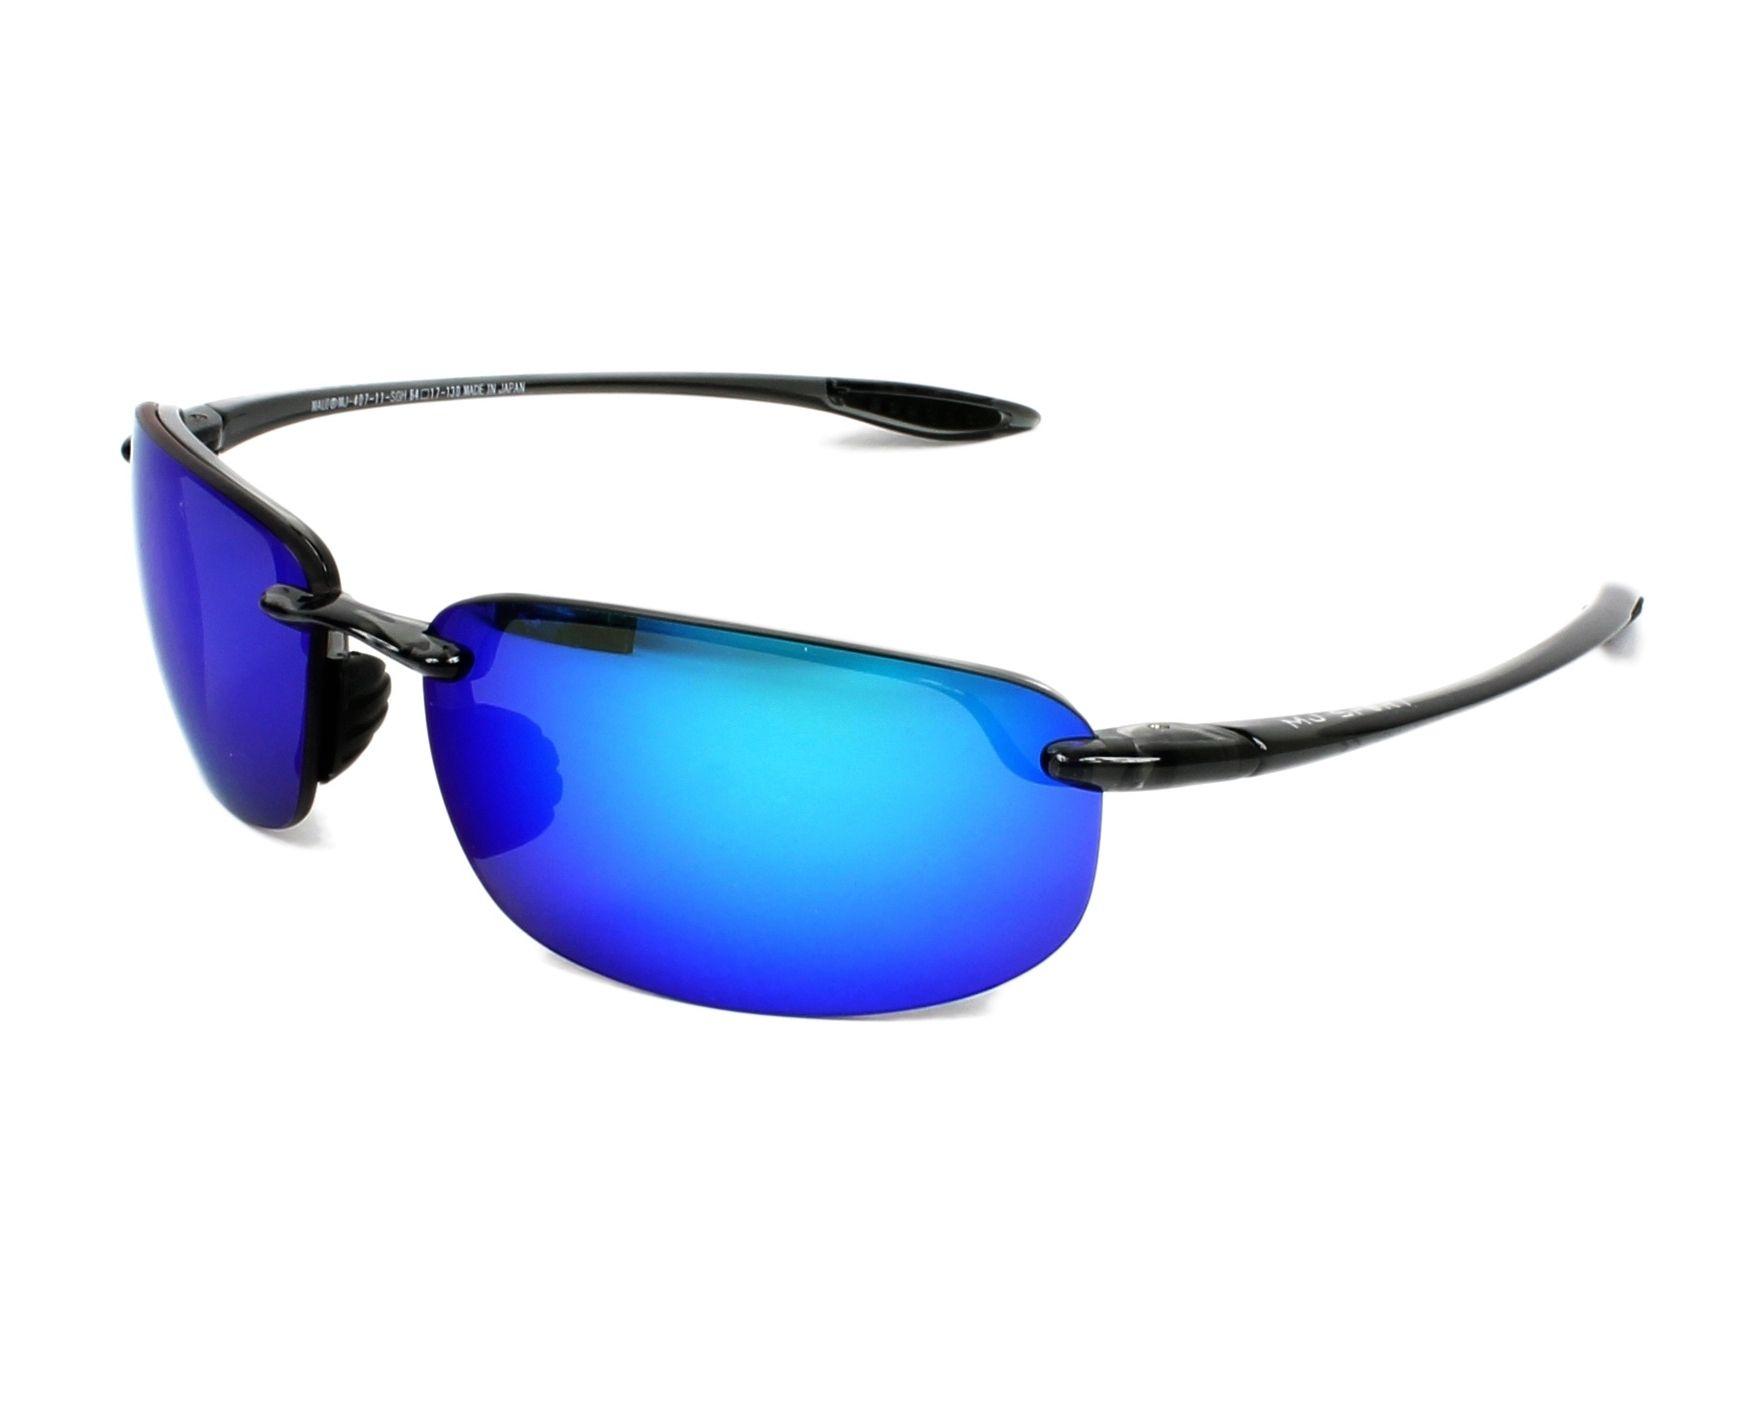 a170ef72bf2 Sunglasses Maui Jim B-407 11 64-17 Grey profile view